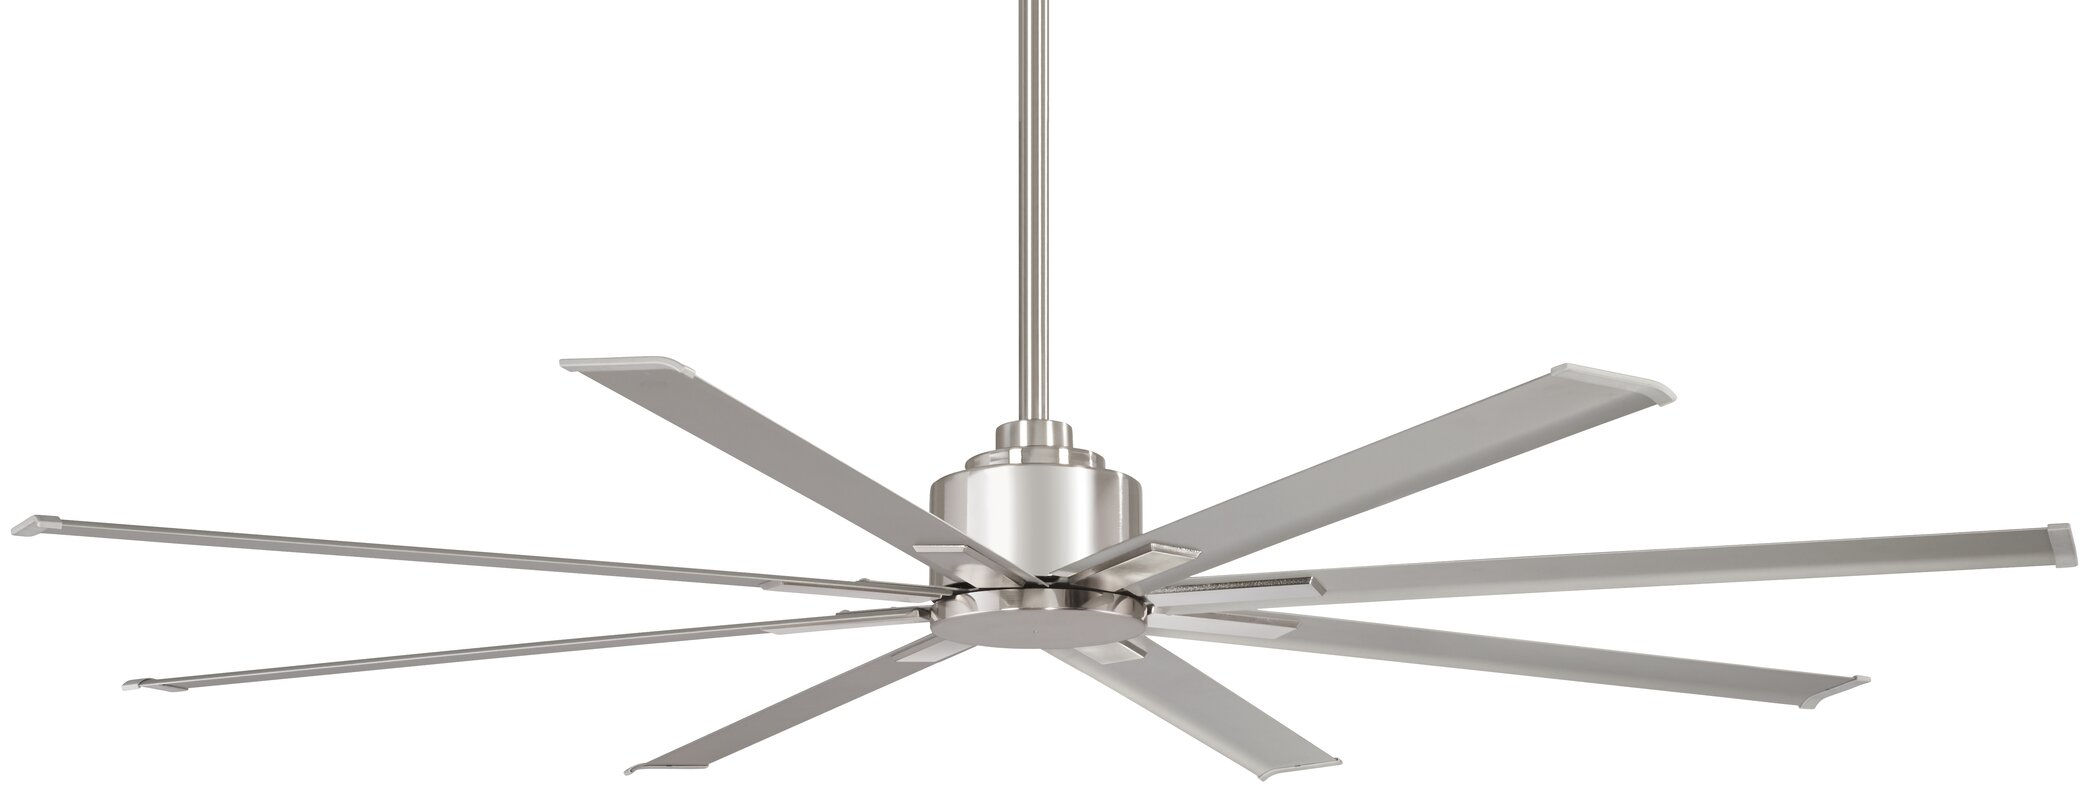 Minka aire 65 xtreme 8 blade outdoor ceiling fan with remote 65 xtreme 8 blade outdoor ceiling fan with remote aloadofball Choice Image